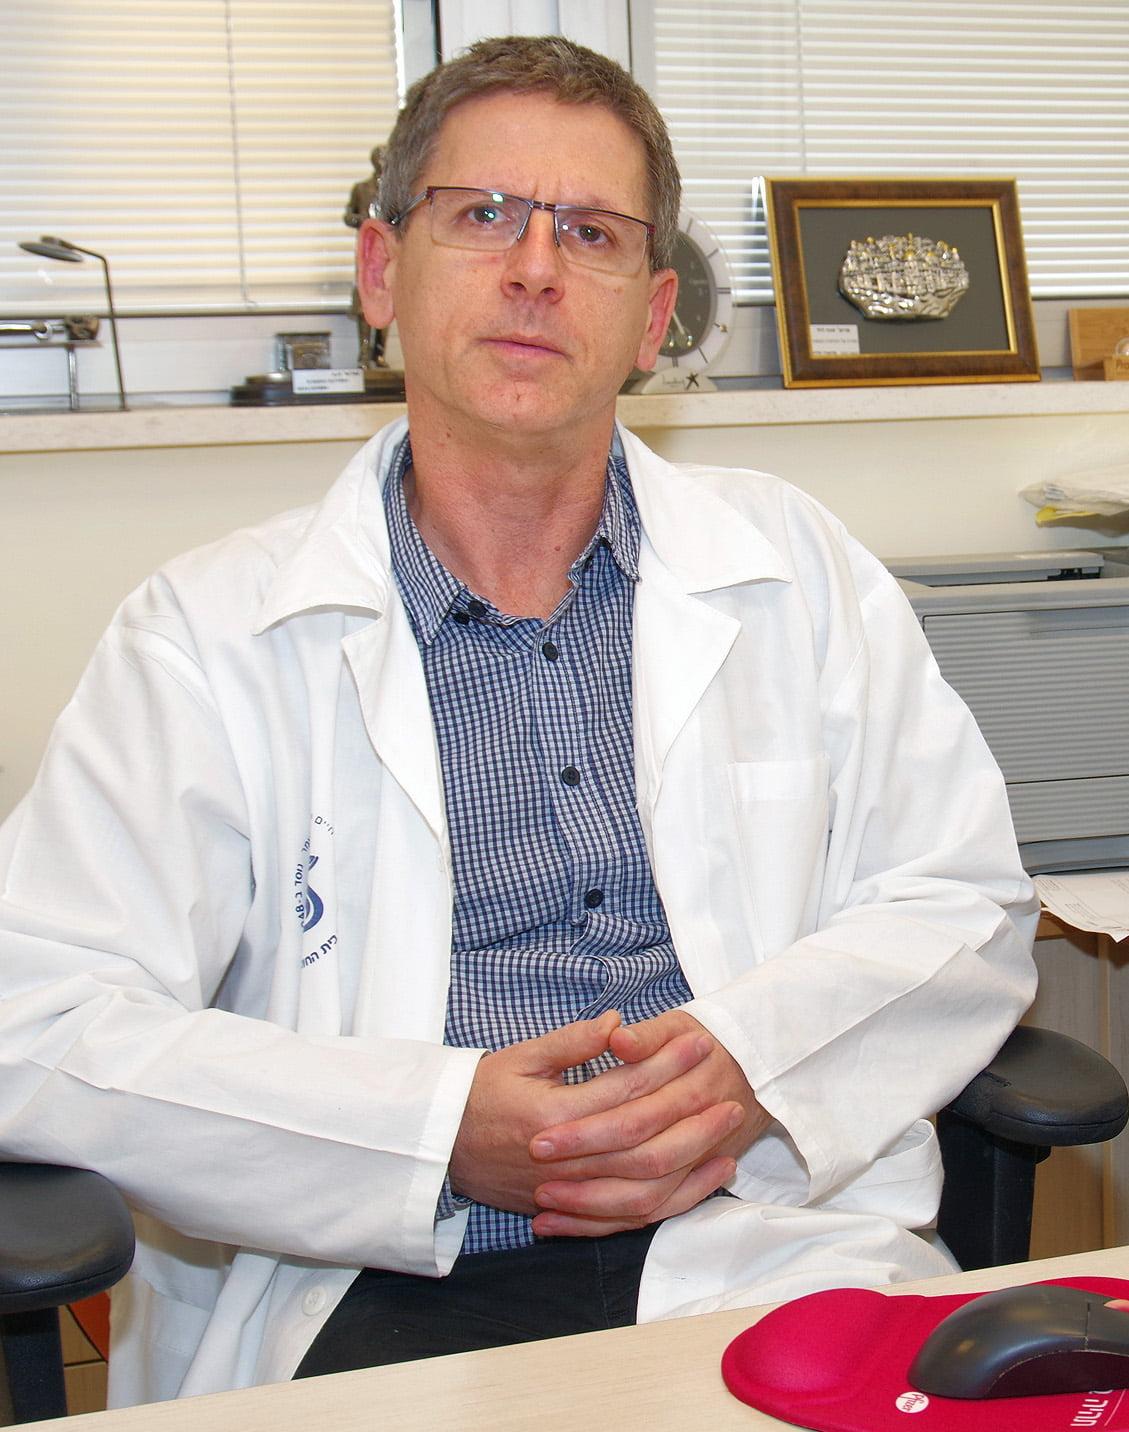 Prof. Tanne